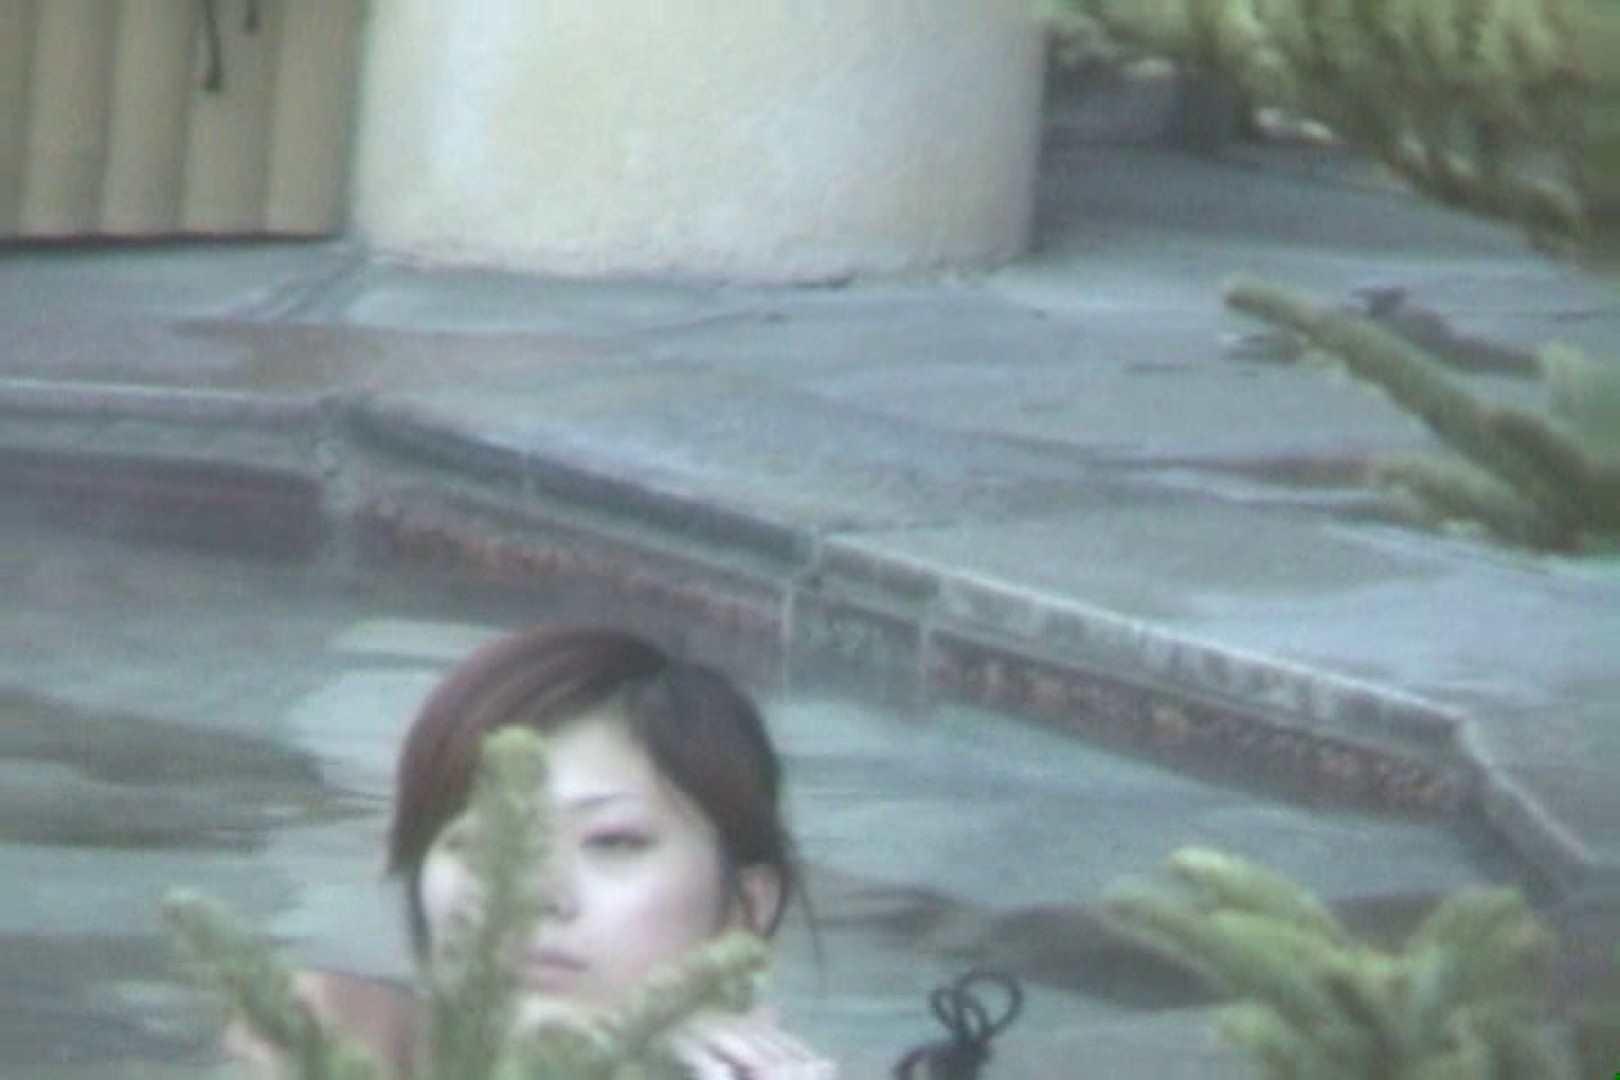 Aquaな露天風呂Vol.609 盗撮映像  58Pix 29